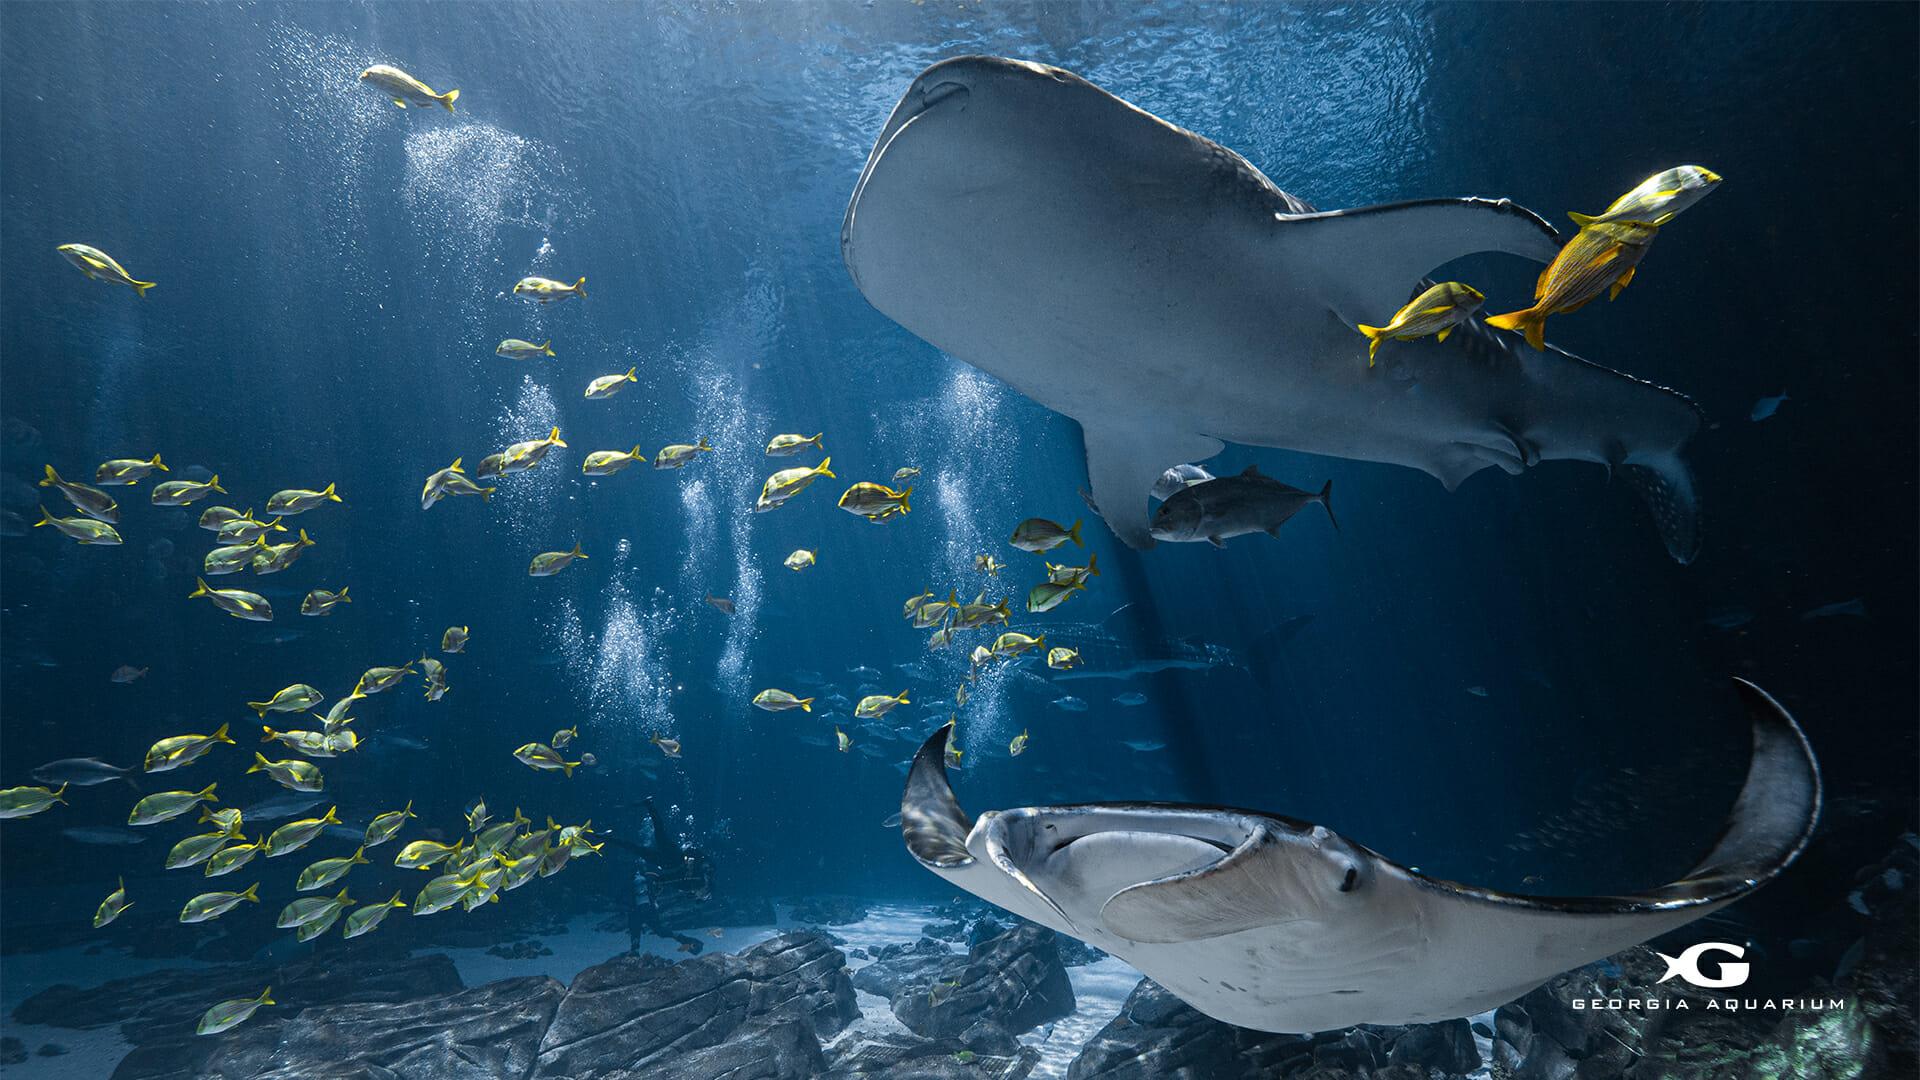 Digital Wallpapers Virtual Backgrounds from Georgia Aquarium 1920x1080